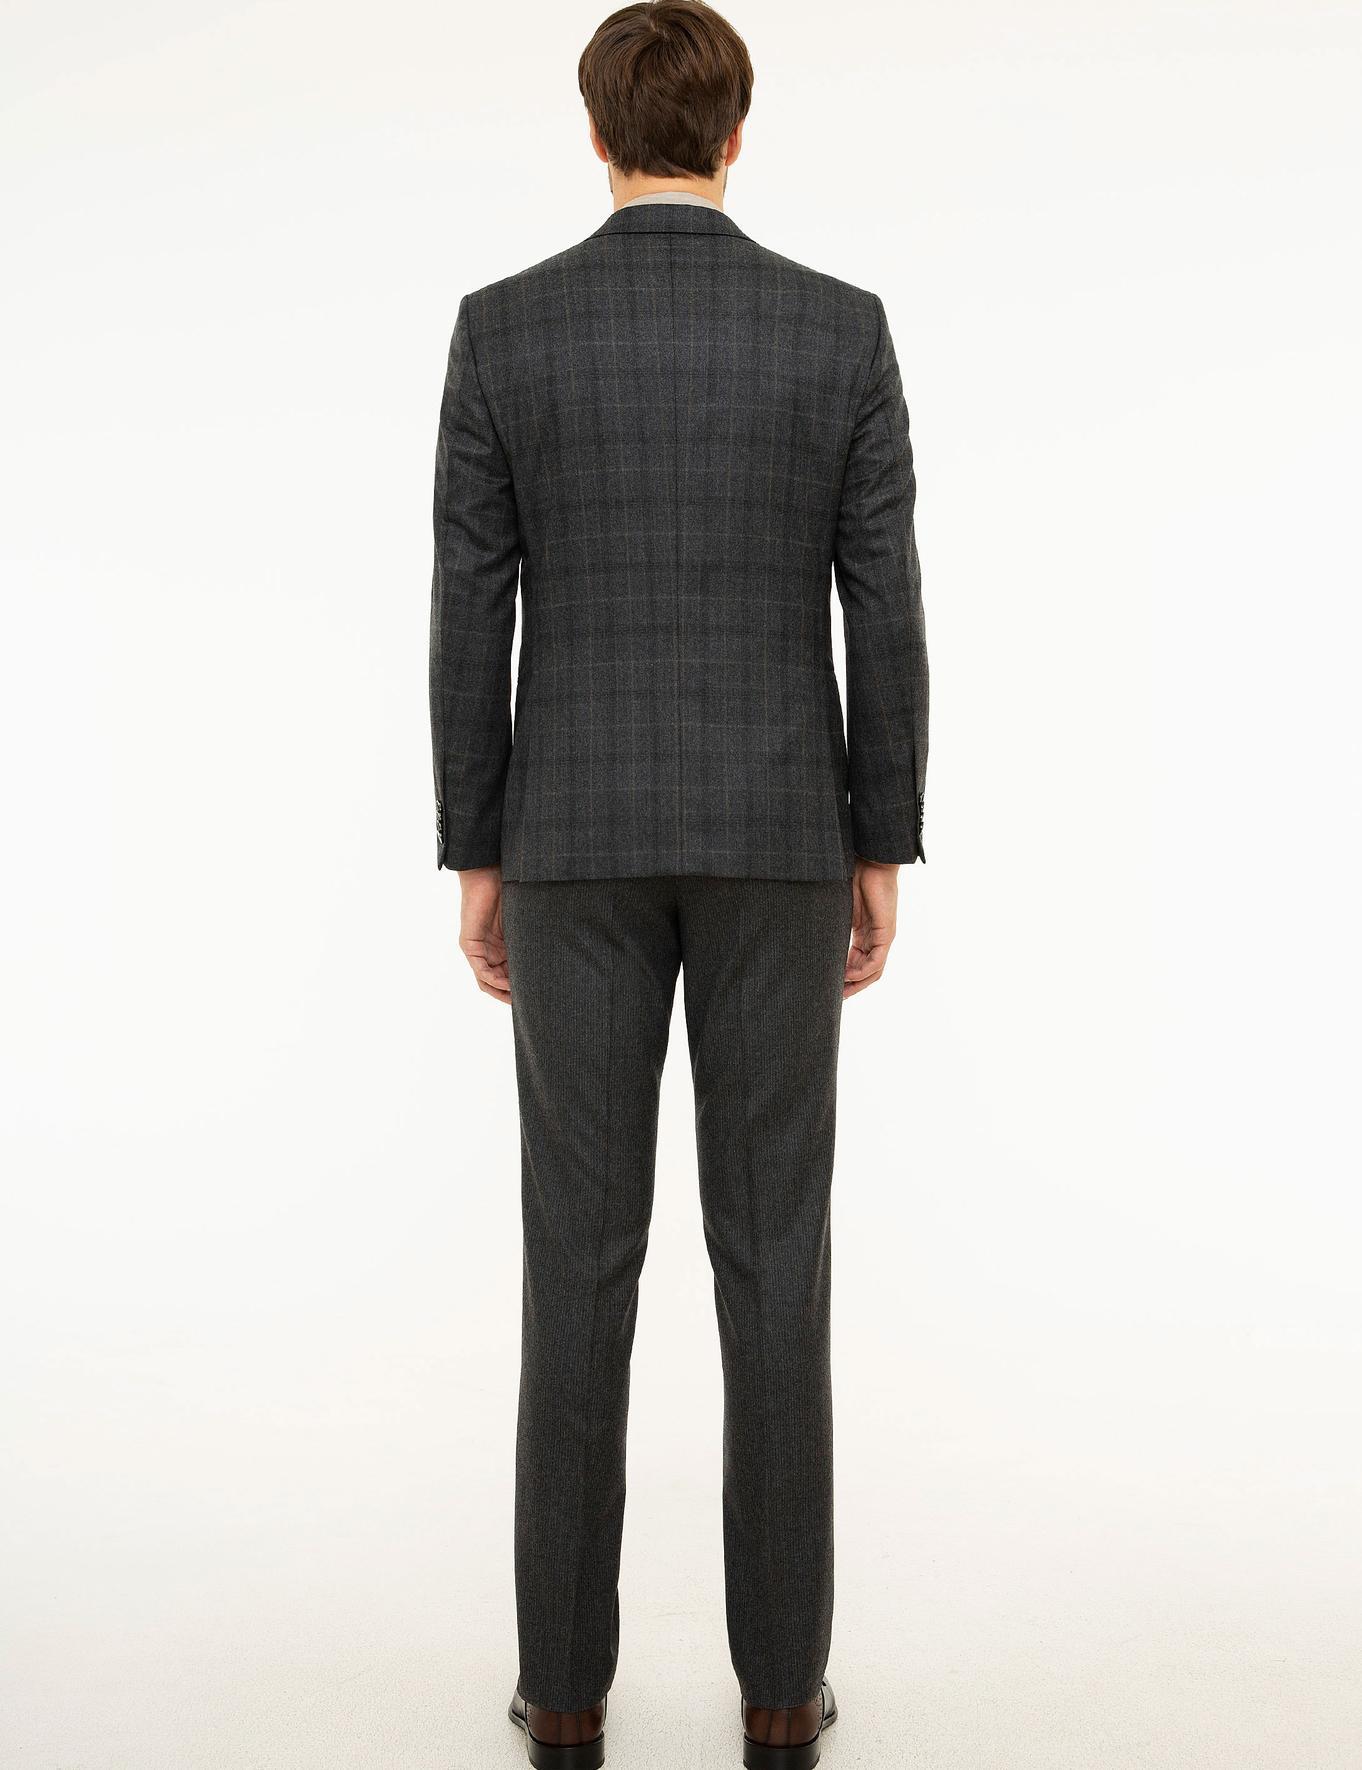 Antrasit Slim Fit Takım Elbise - 50213901014